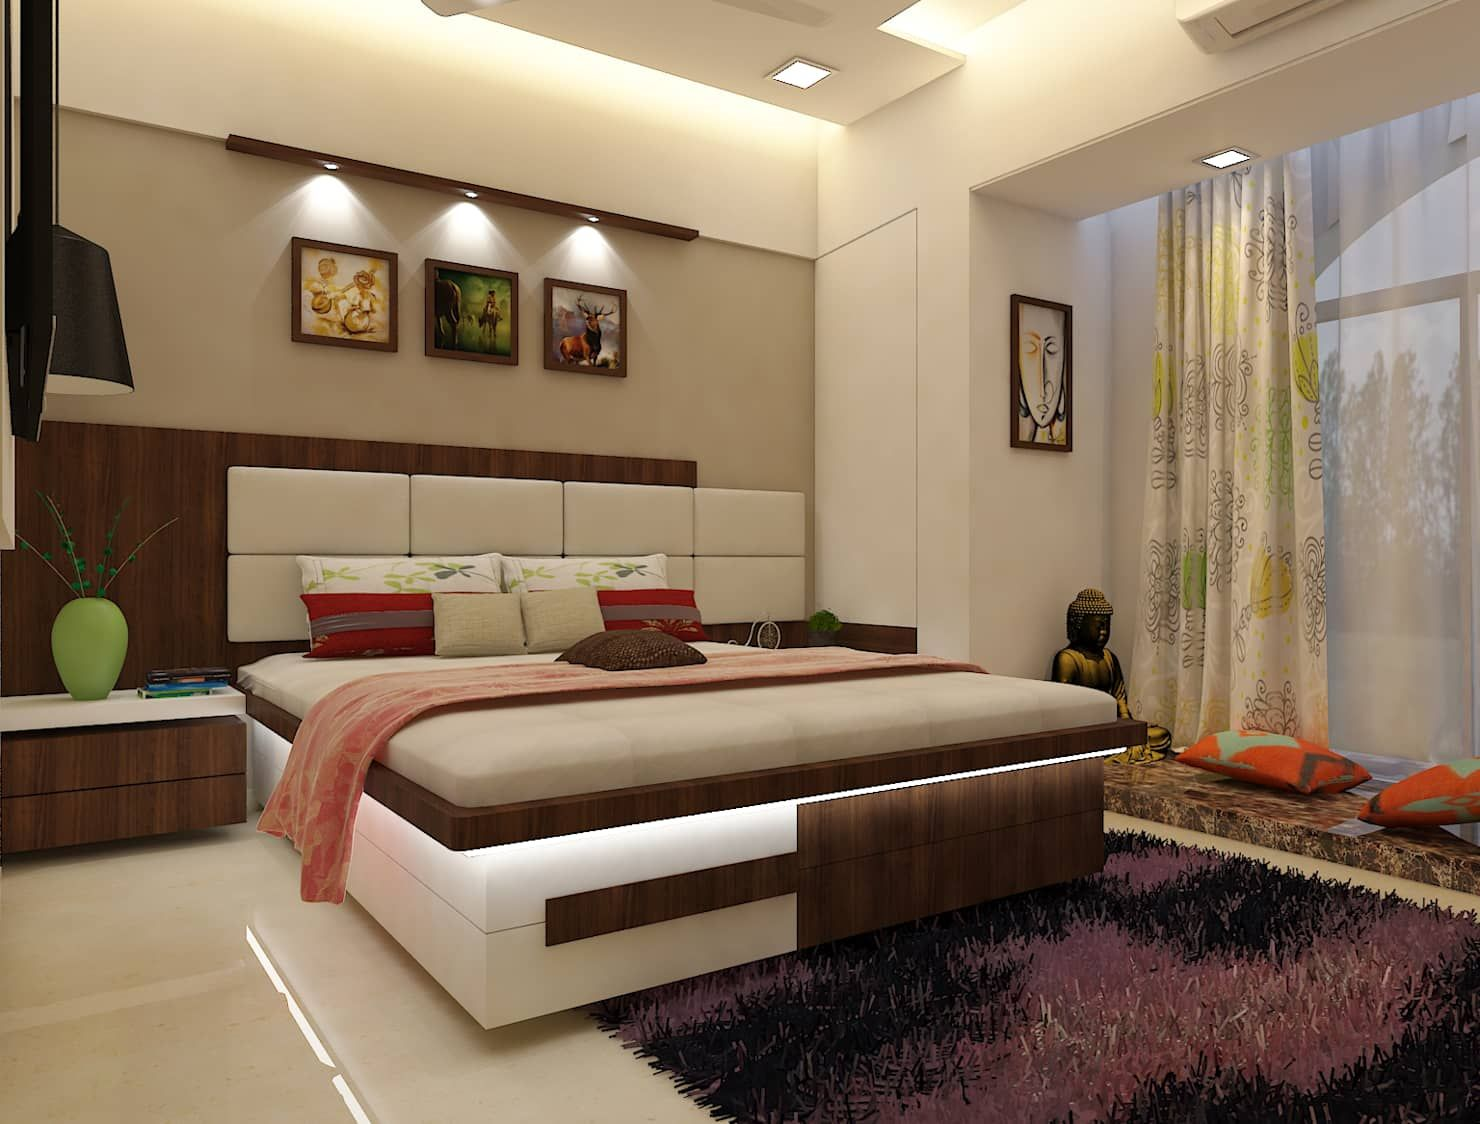 Bedroom Modern Style Bedroom By N Design Studio Interior Designer Mumbai Modern Homify Modern Style Bedroom Bed Design Modern Luxury Bedroom Design Bedroom bad design 2021